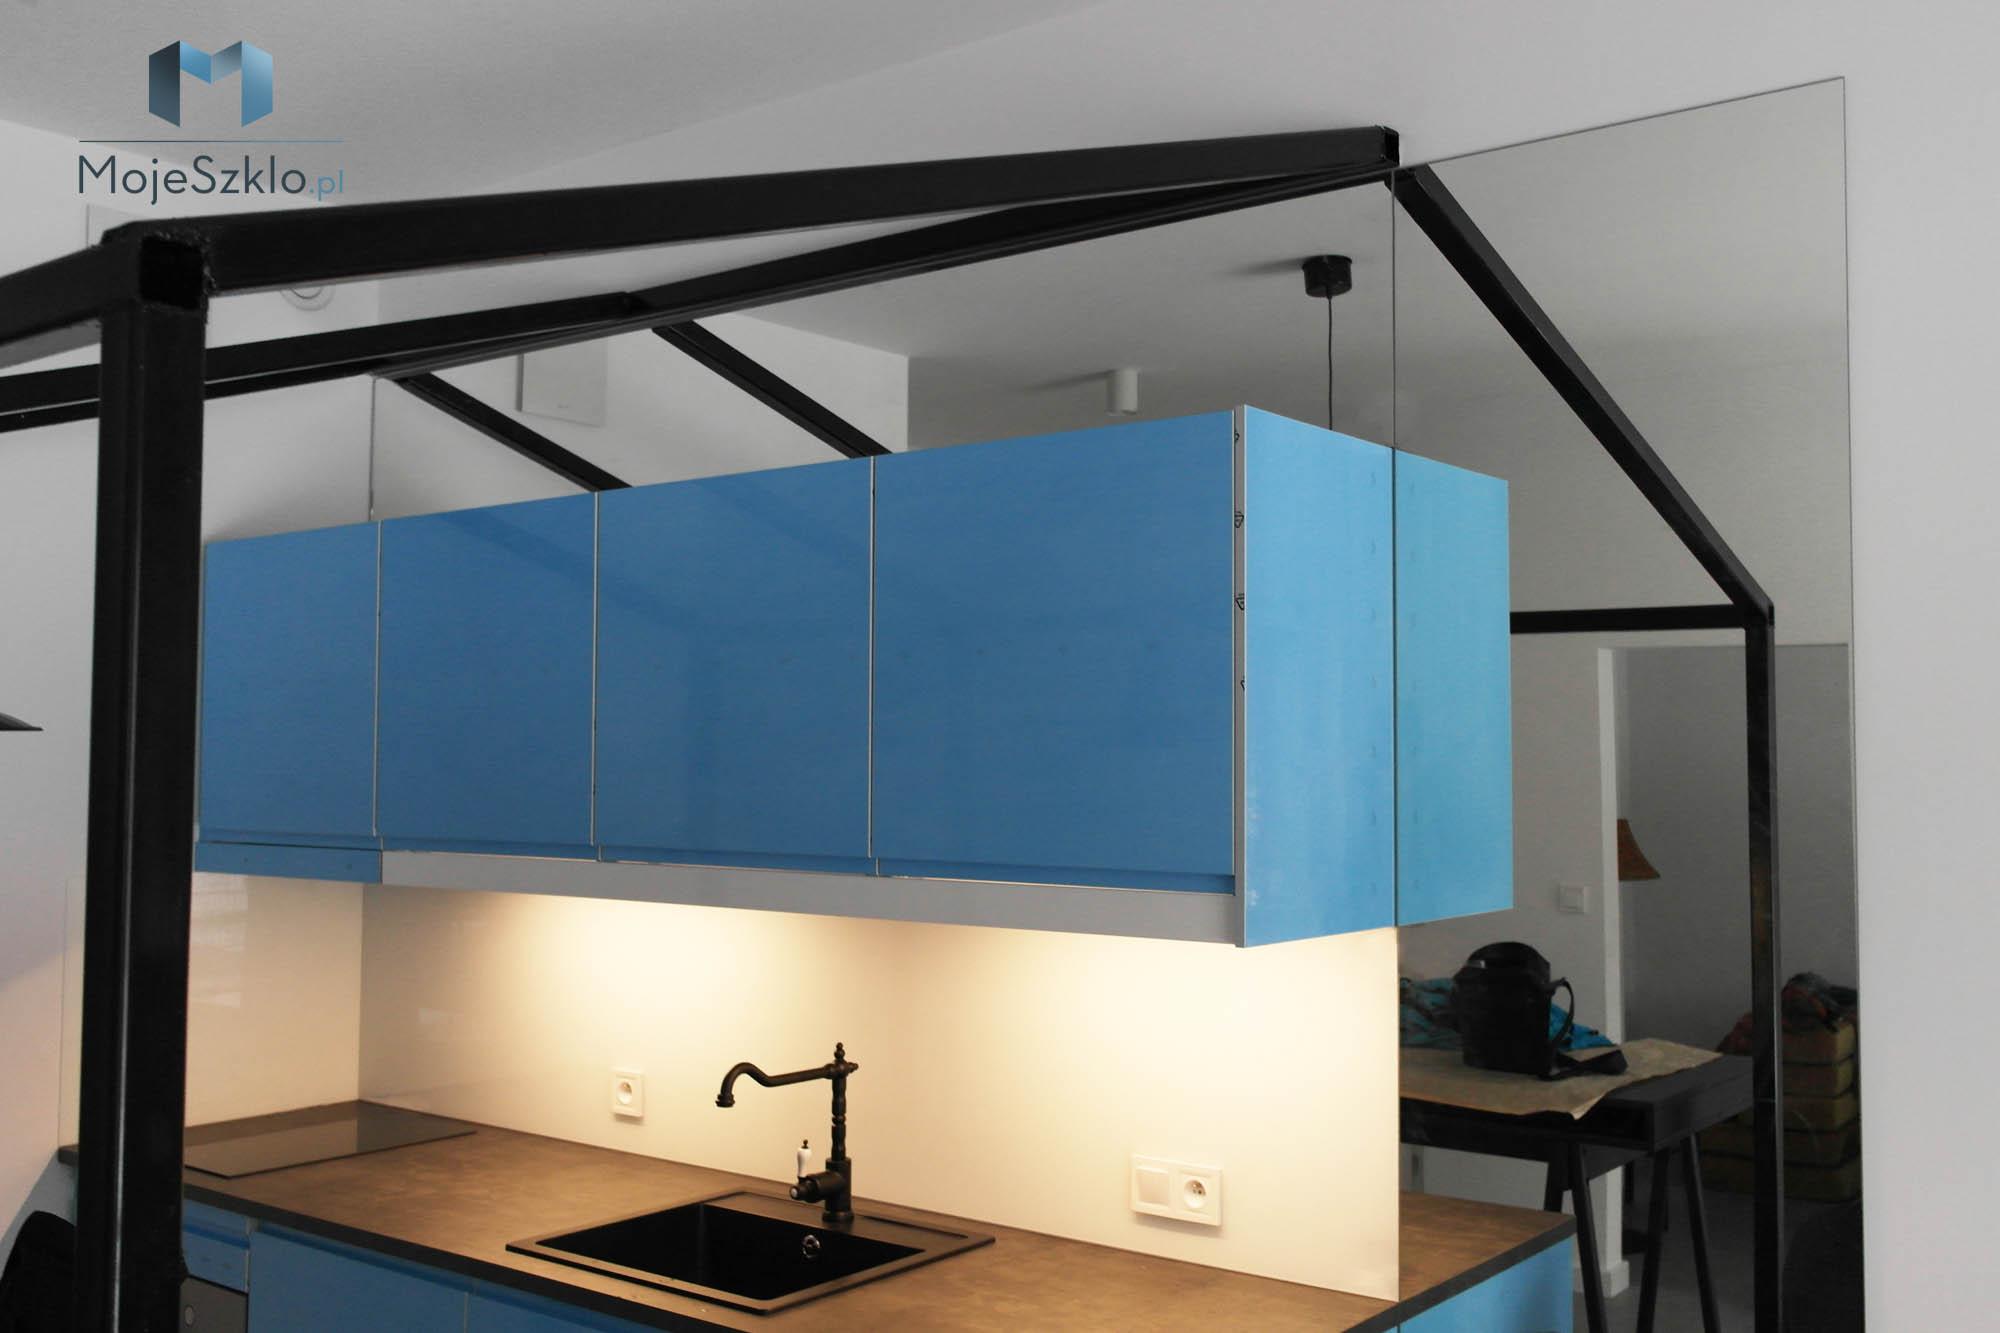 Lustro W Kuchni Duze Ozdobne - Lustro w kuchni. Panele lustrzane do kuchni